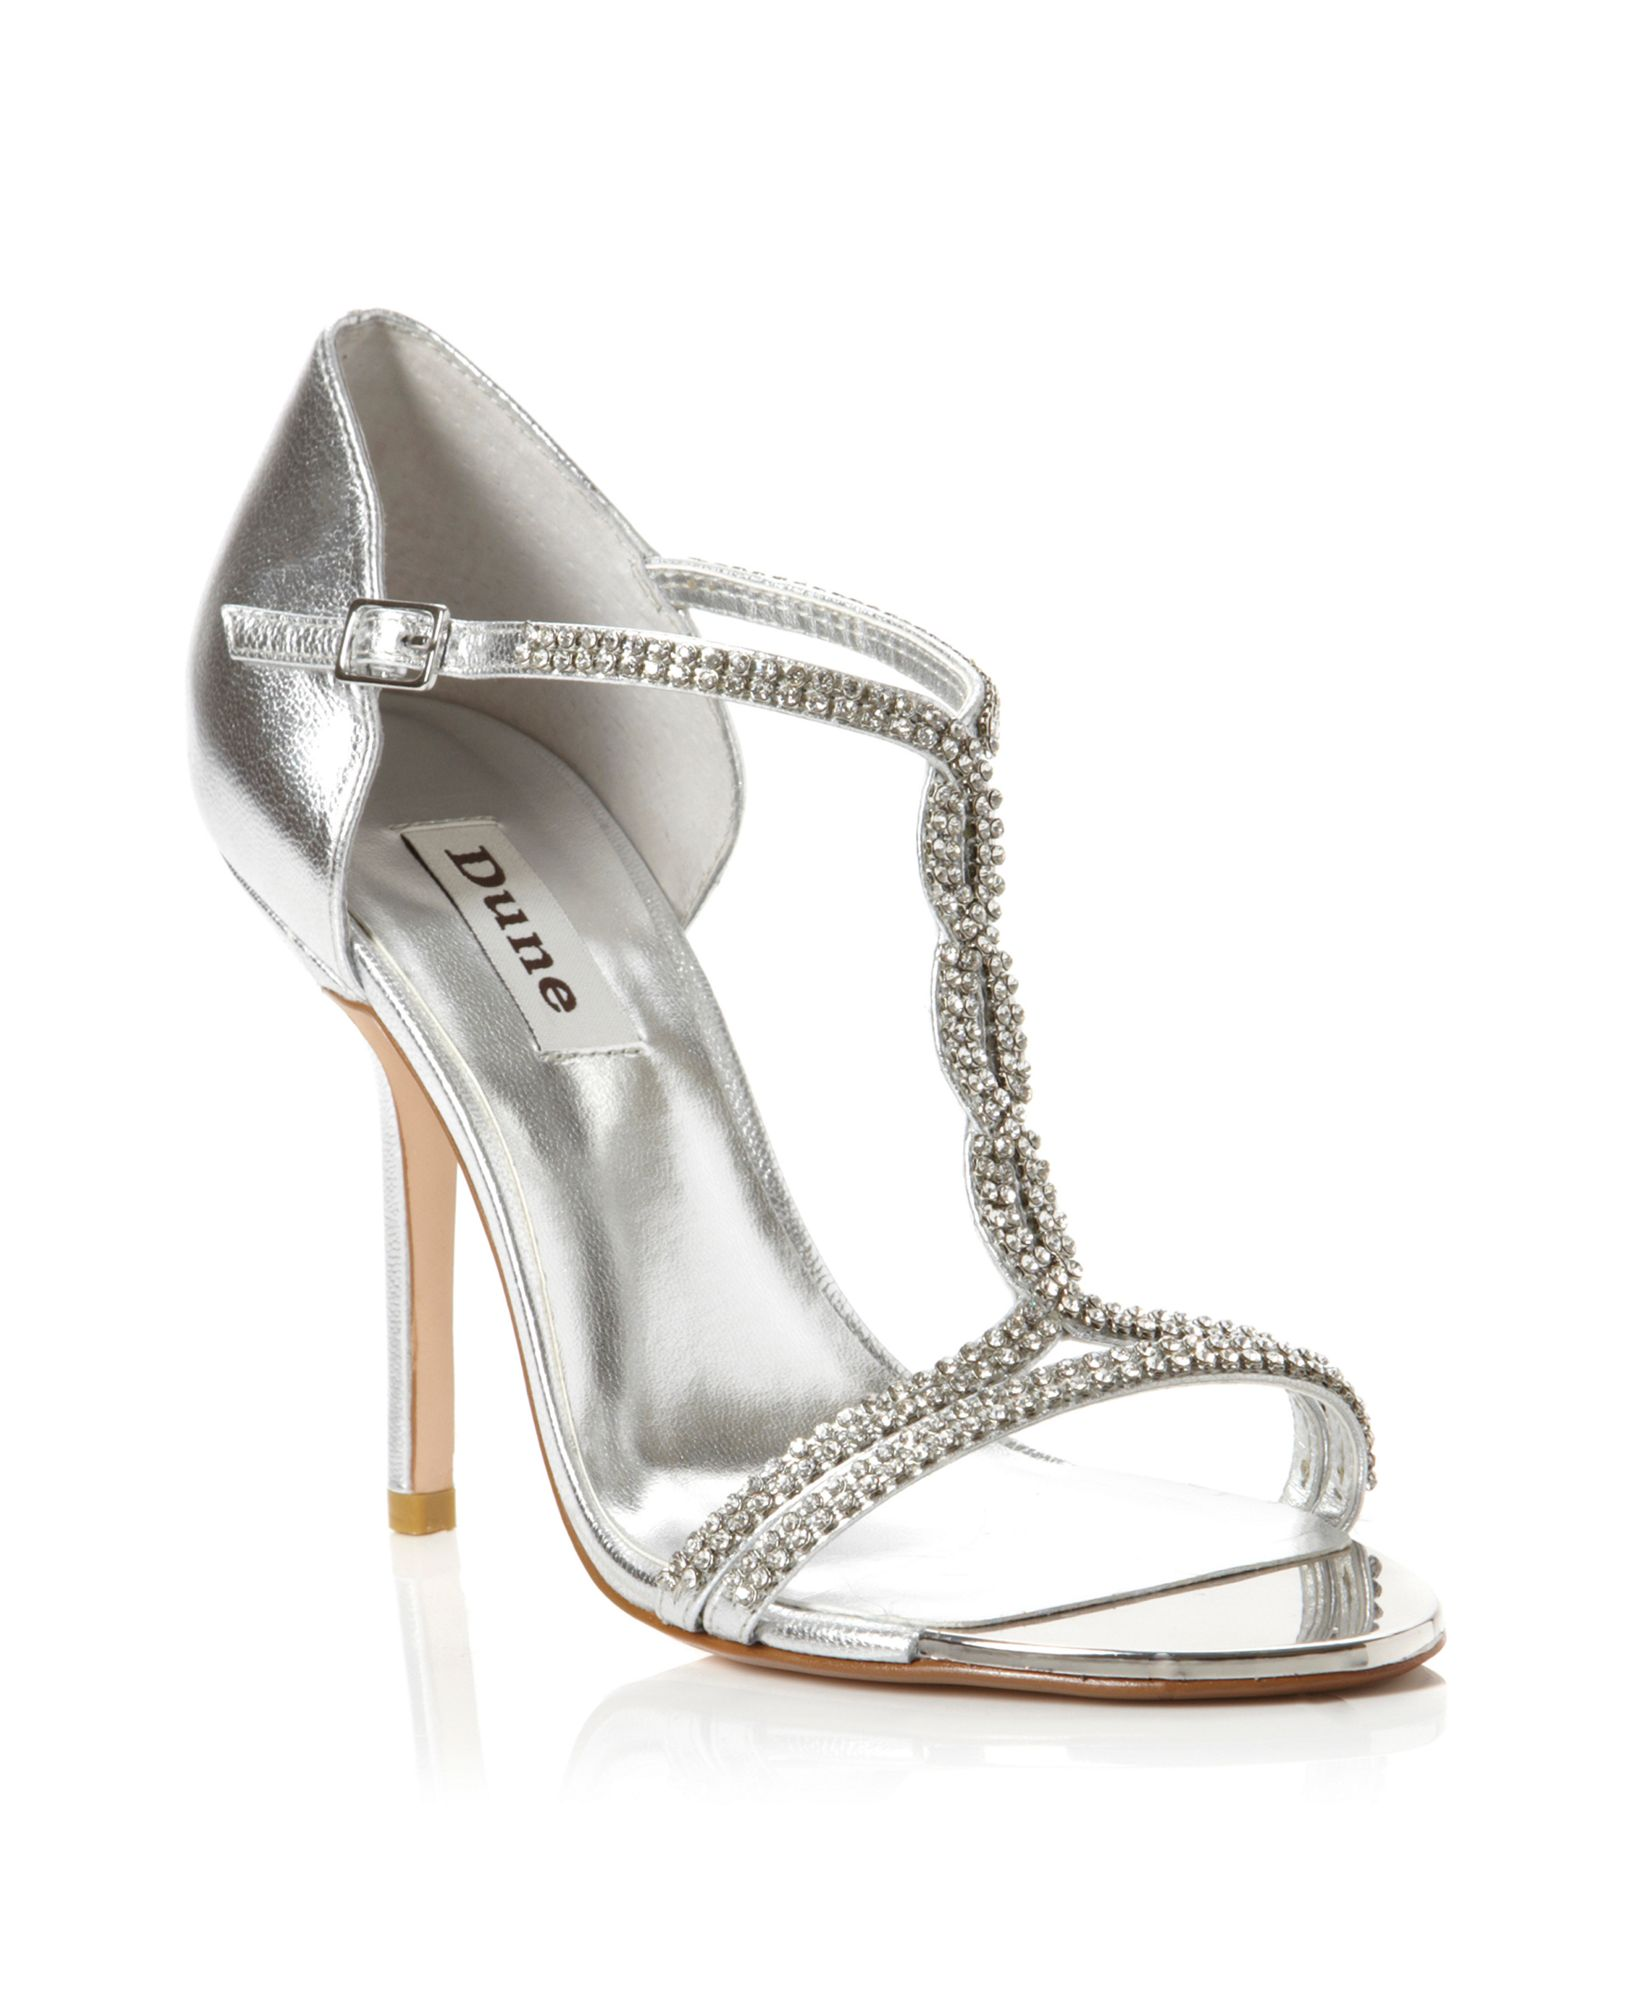 Dune Honour Diamante T Bar Sandals in